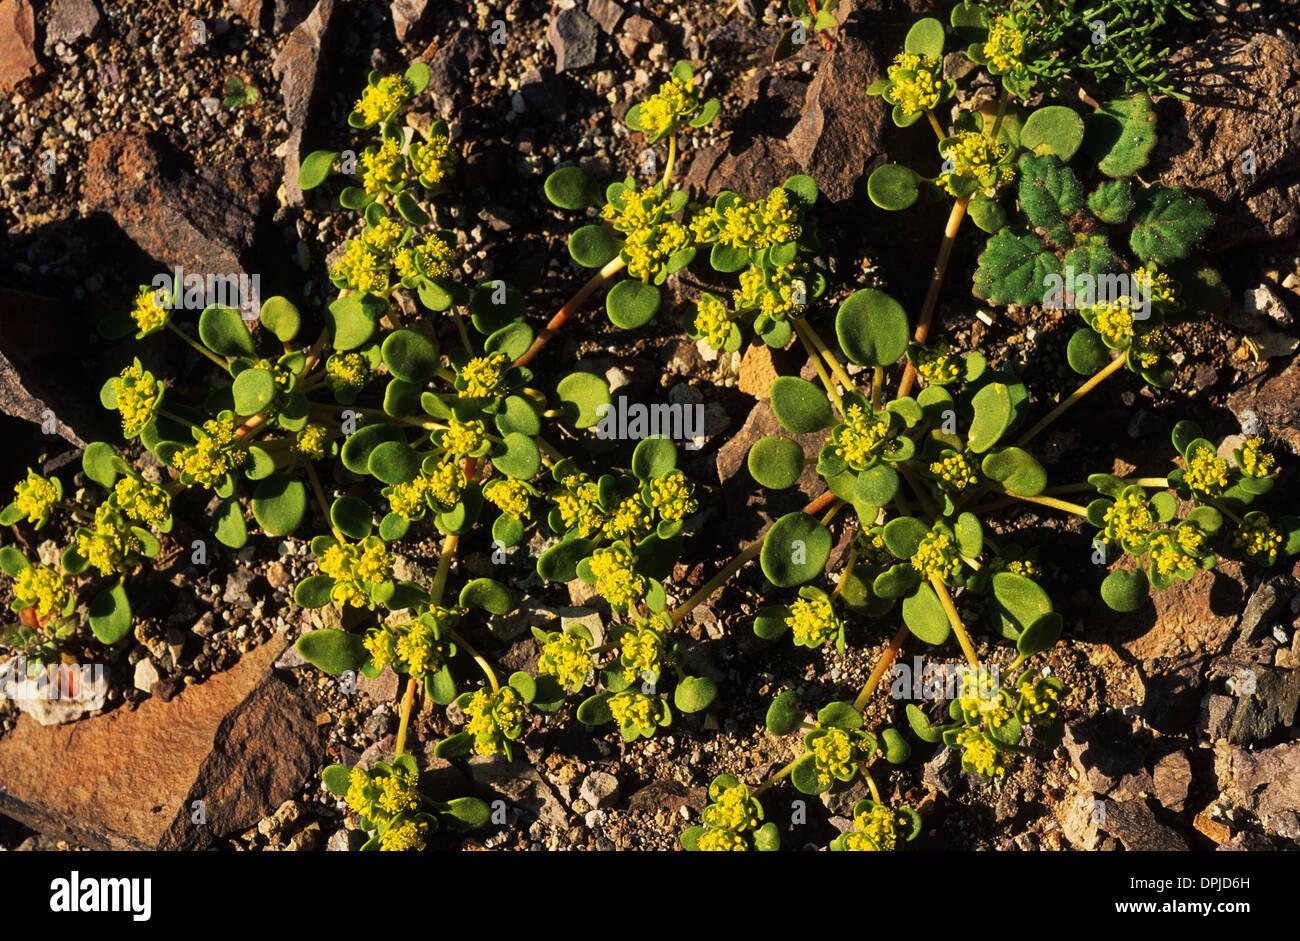 Elk248-1794 California, Death Valley National Park, spring display of flowers, Gold Carpet - Stock Image